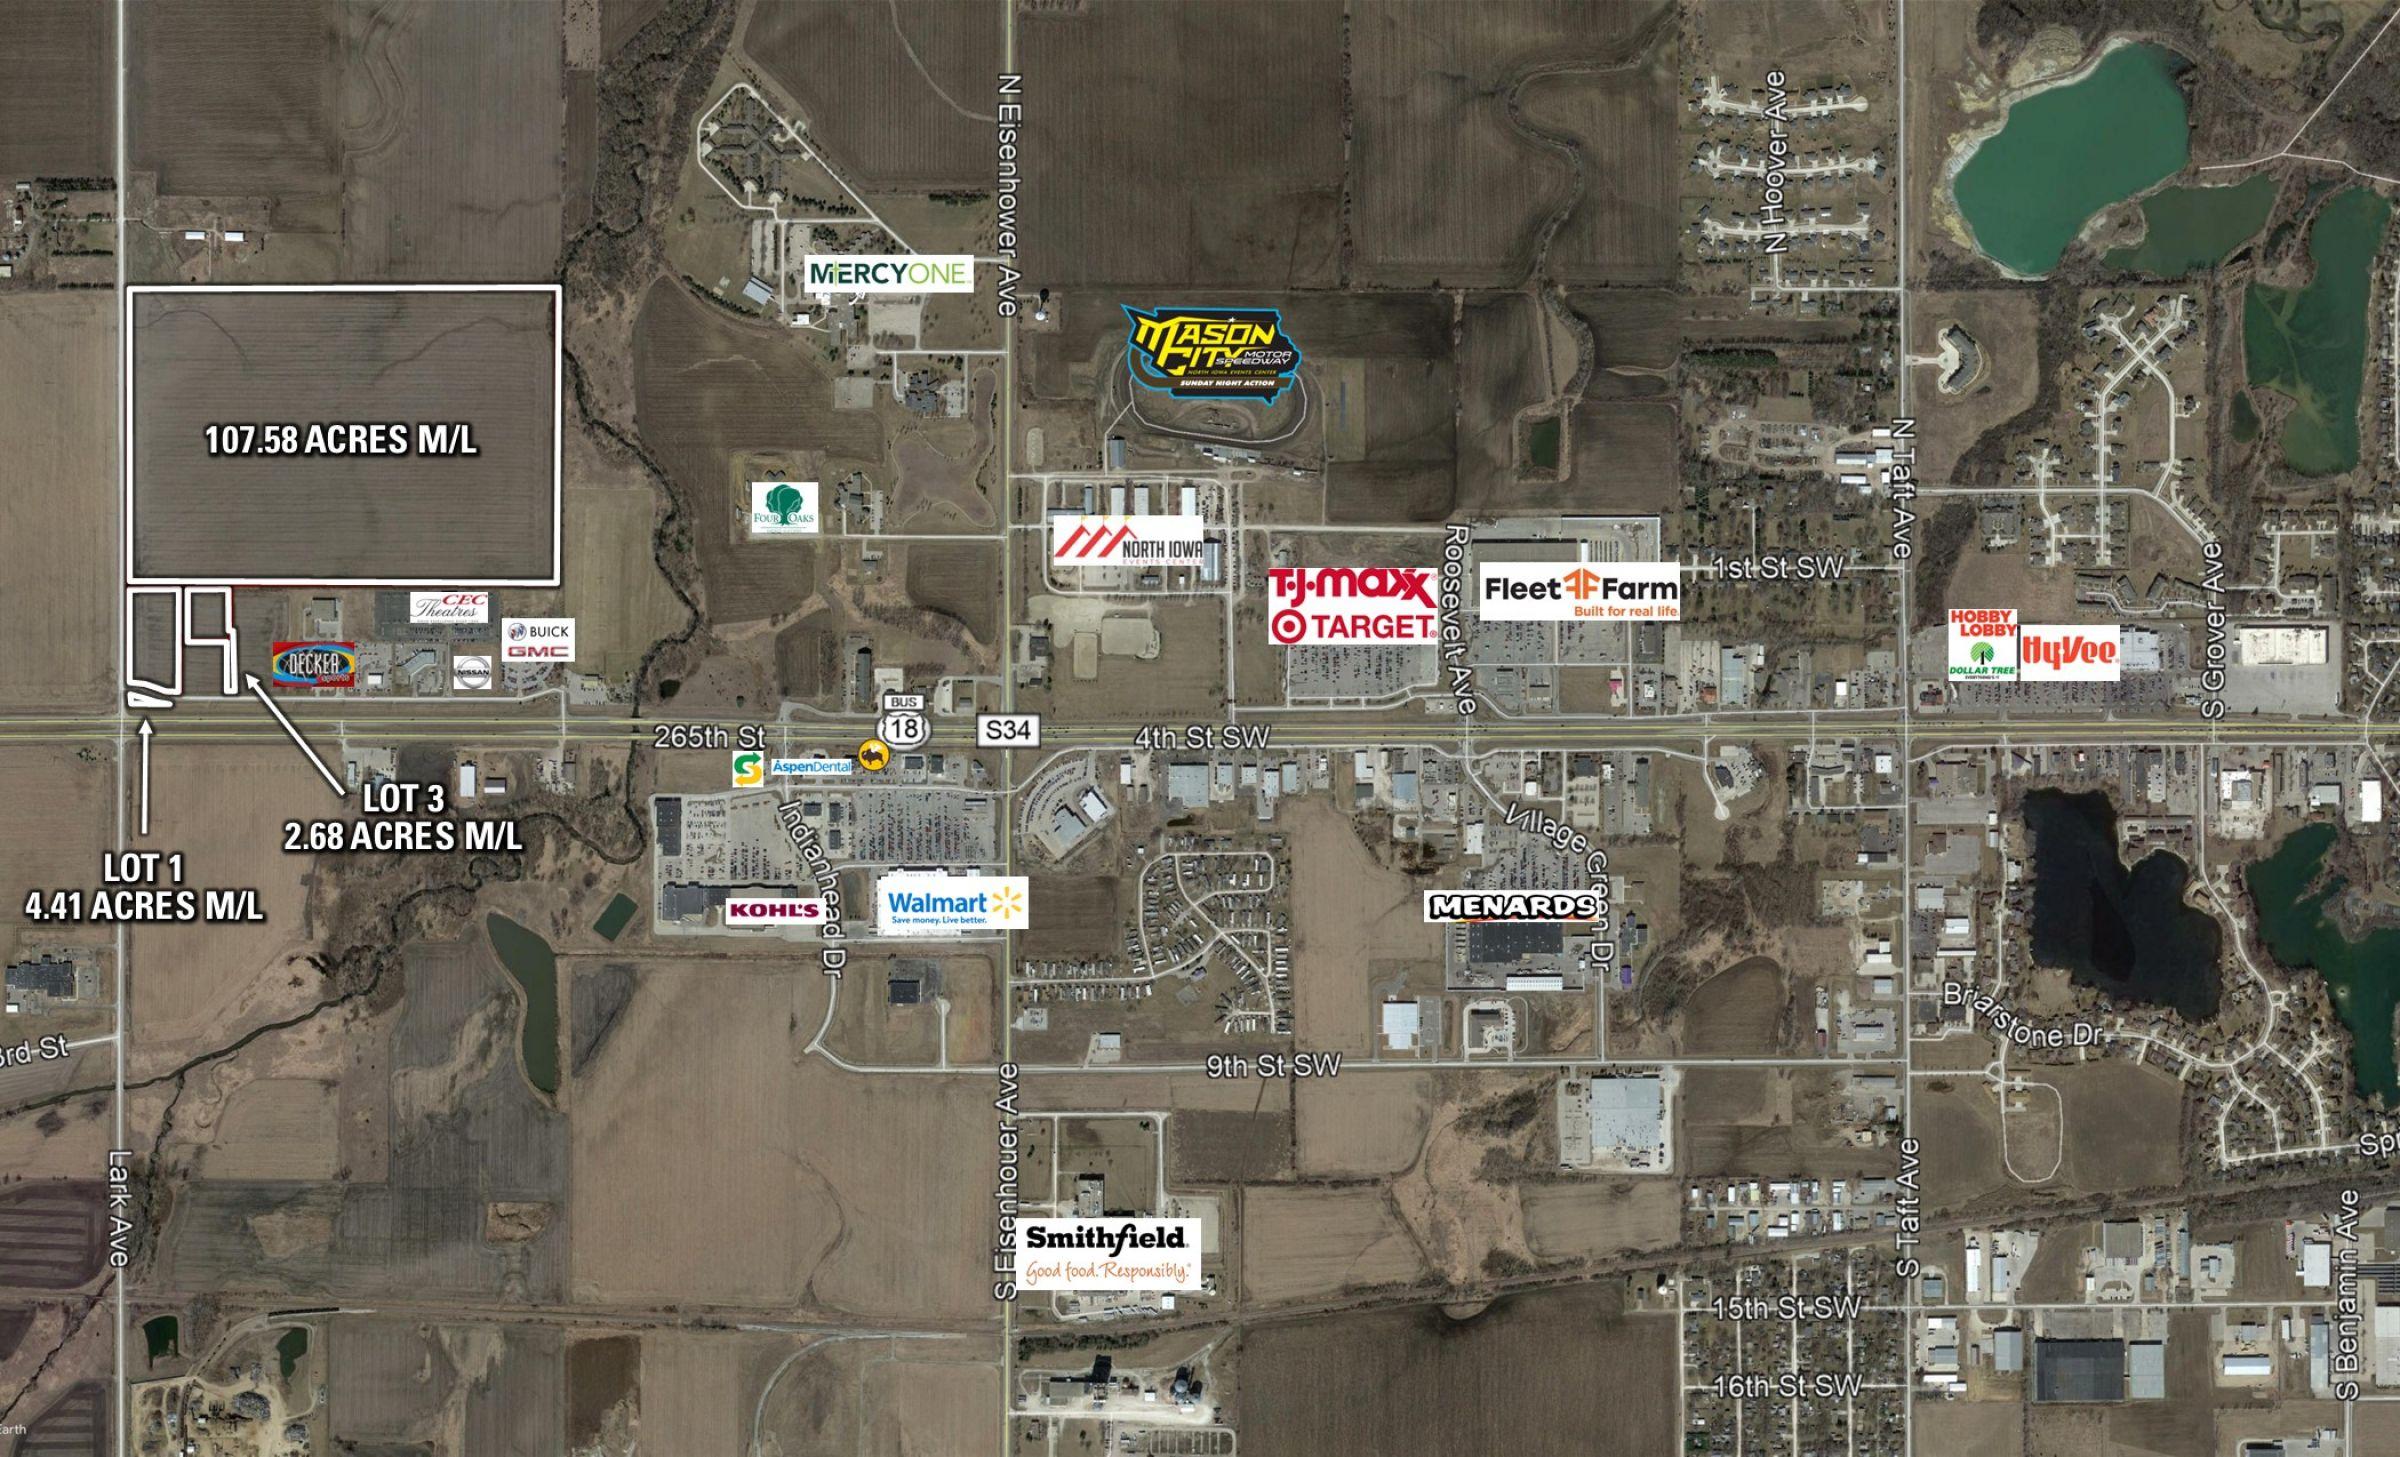 development-land-commercial-cerro-gordo-county-iowa-4-acres-listing-number-15642-0-2021-07-20-164800.jpg